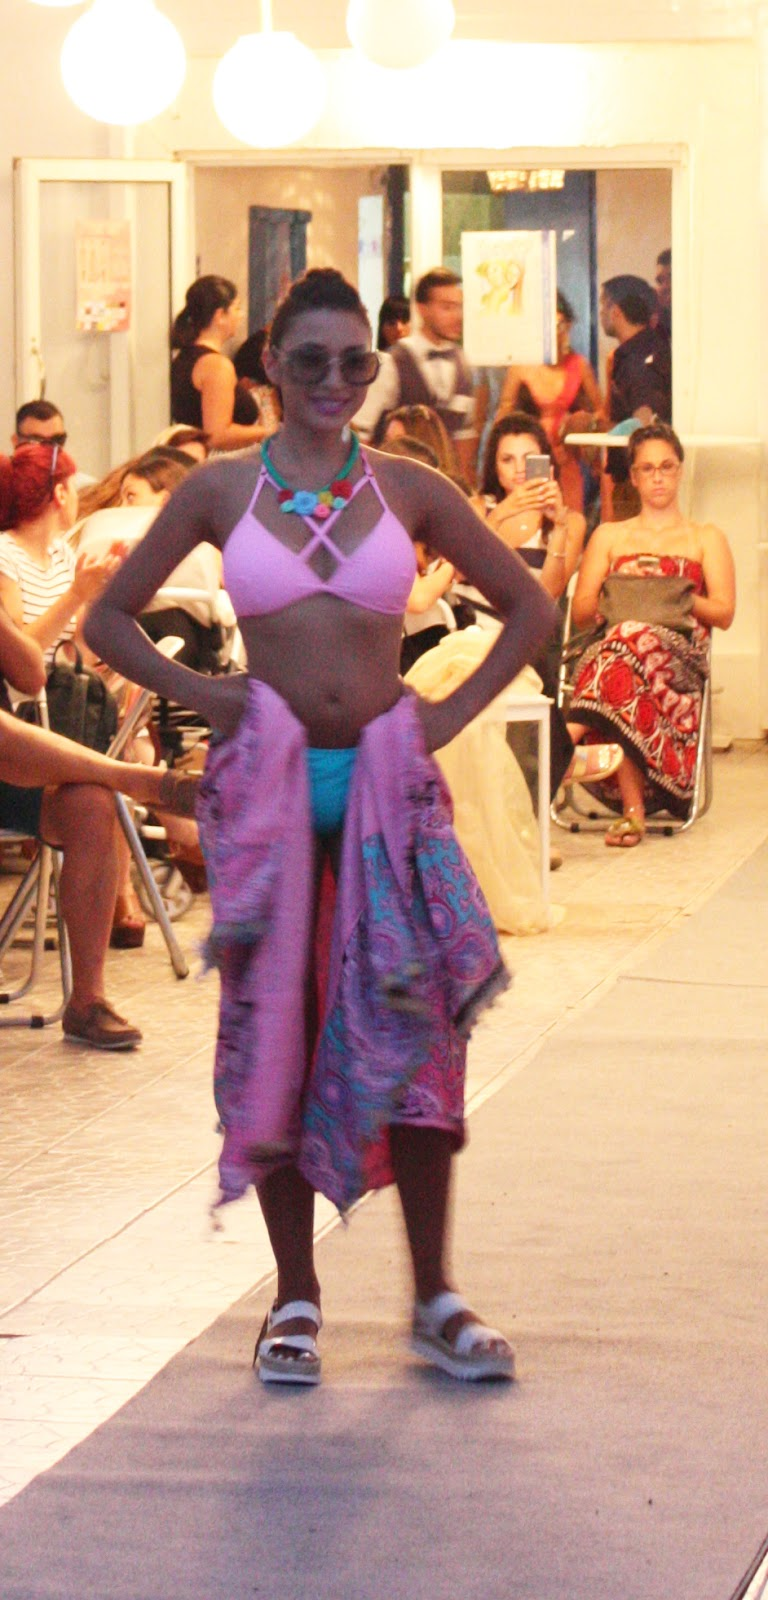 133fa7554090 Το VISION freepress by Aegeancloud παρουσιάζει την επίδειξη μόδας ...